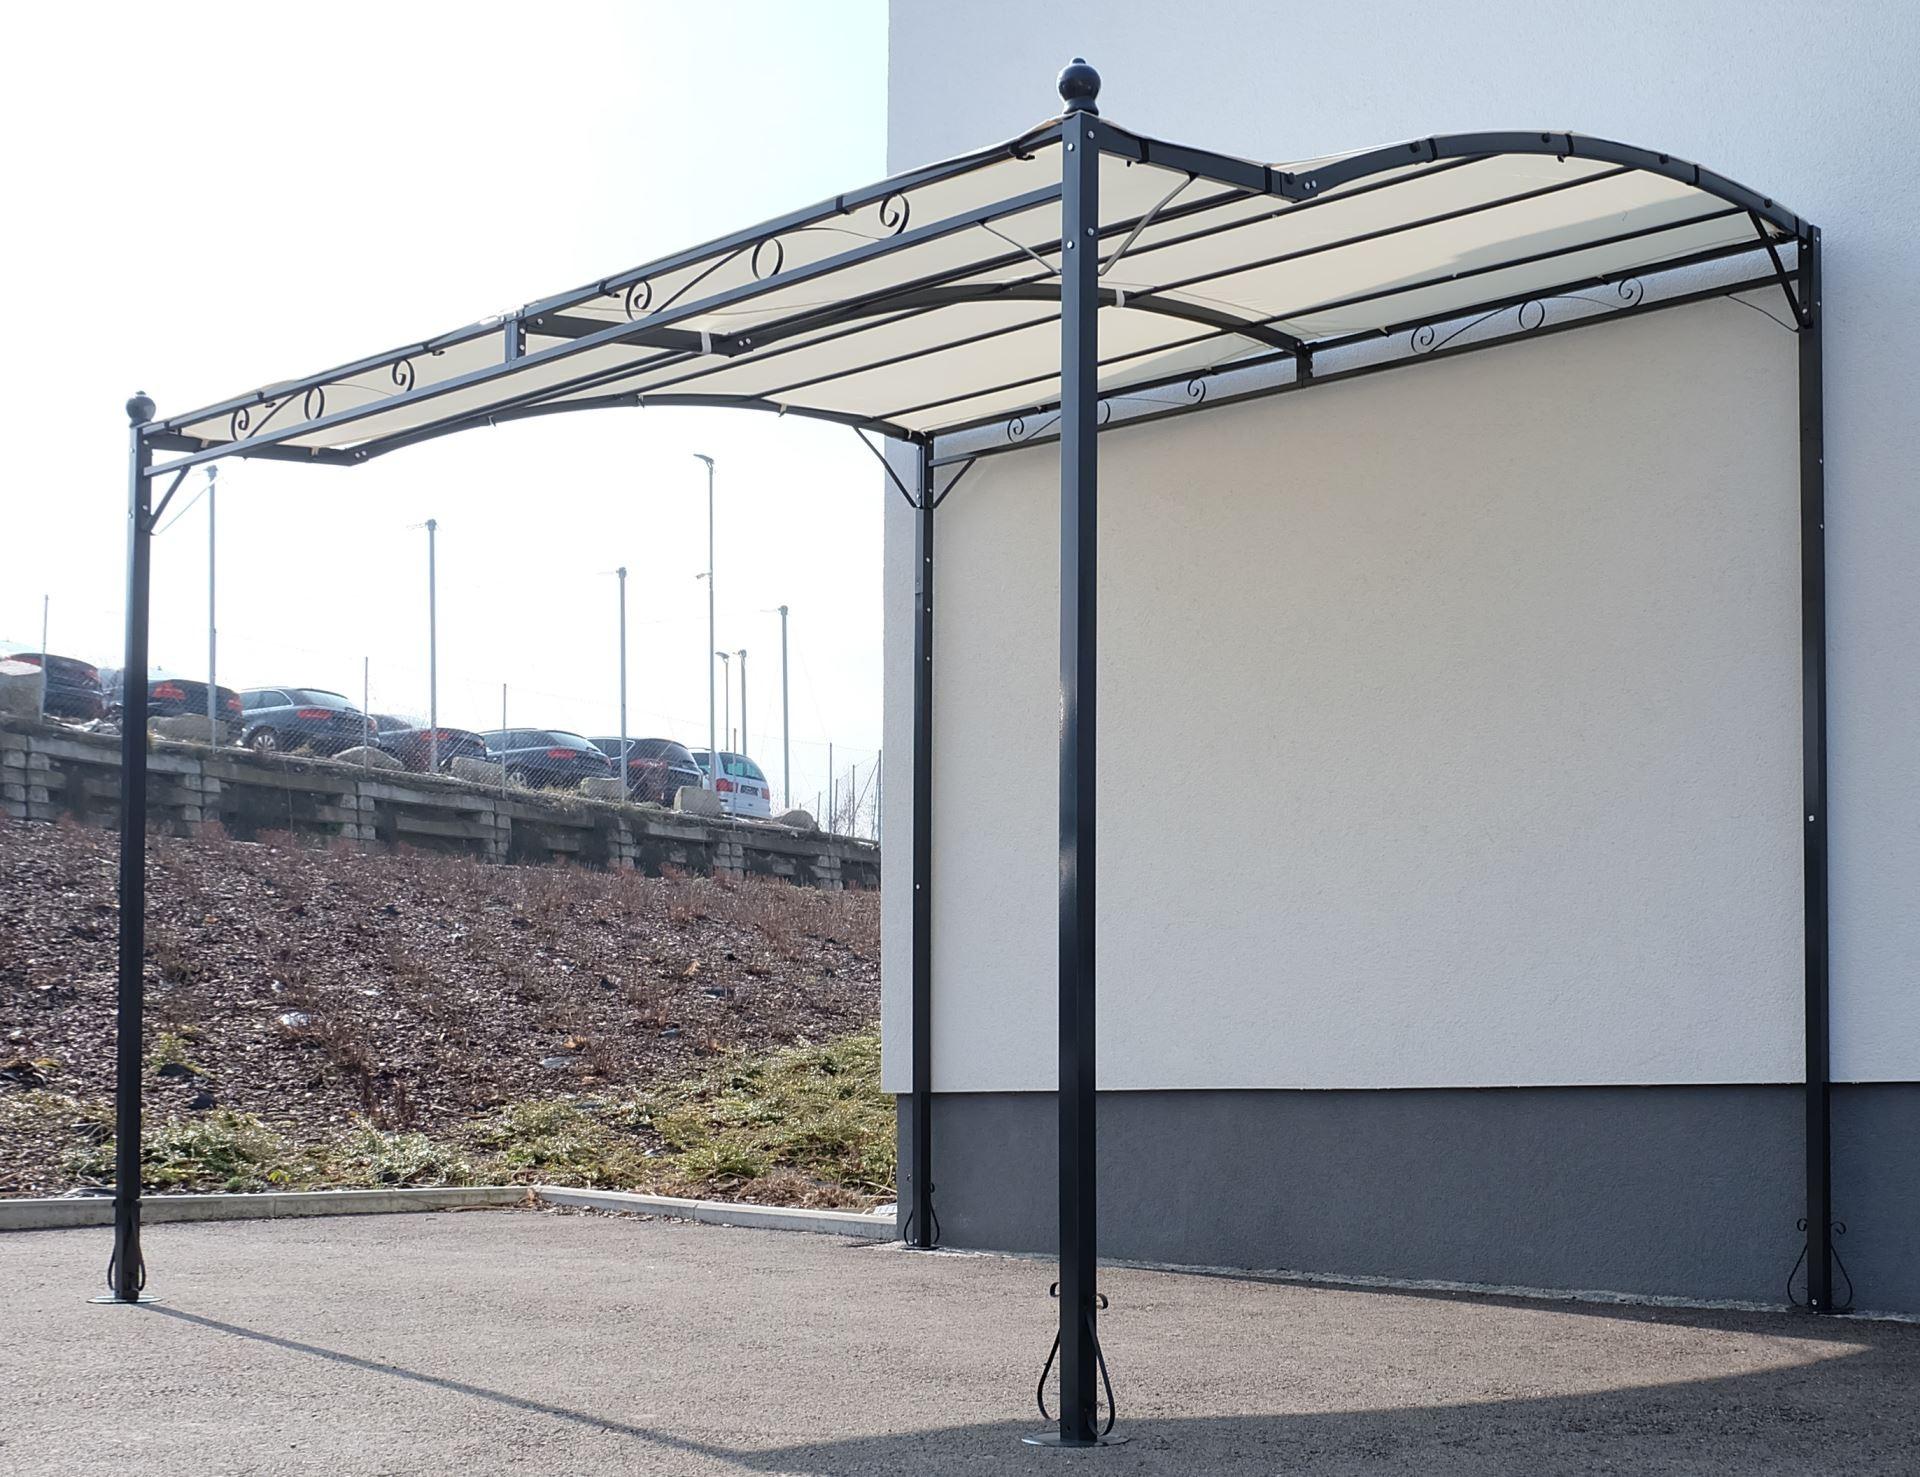 wand anbau pavillon 3 x 2 5 meter mit dach 100 wasserdicht uv30 model topea kaufen bei as